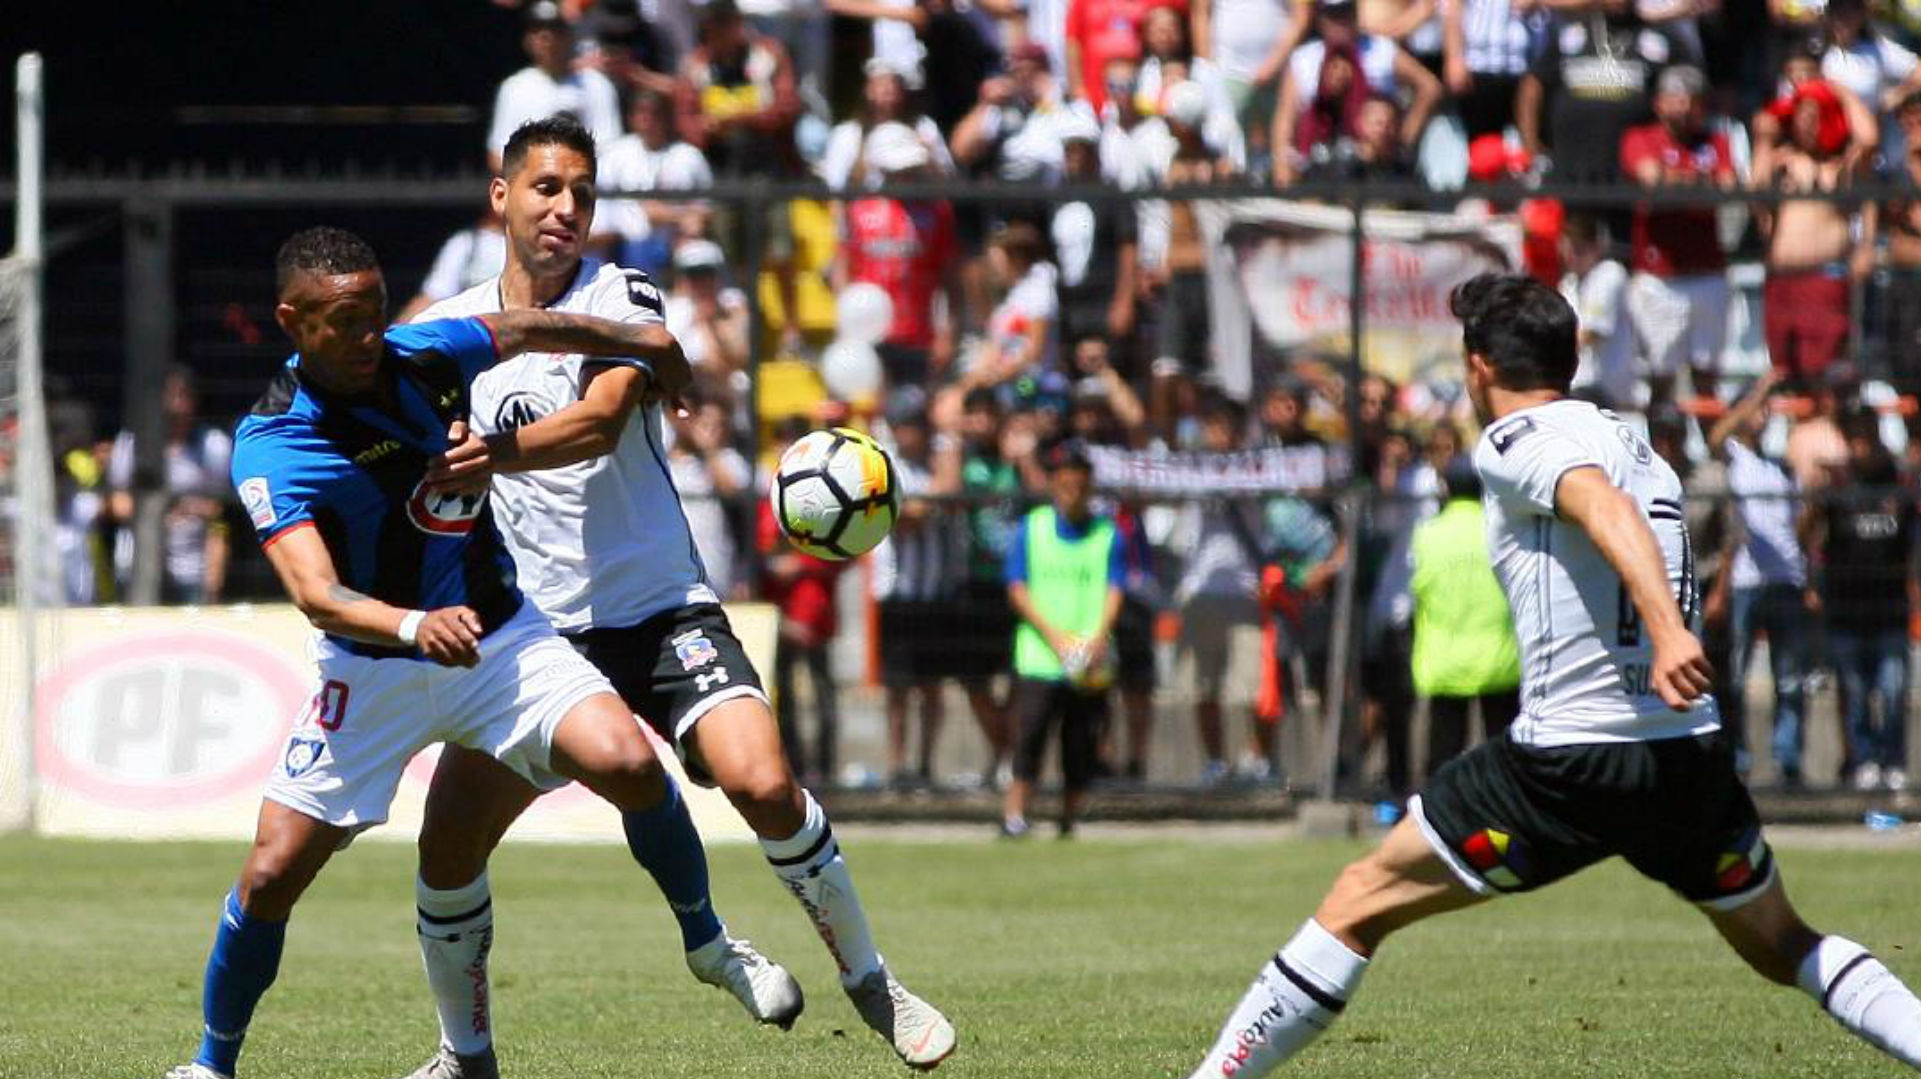 241118 Gabriel Torres Gabriel Suazo Juan Manuel Insaurralde Huachipato Colo Colo